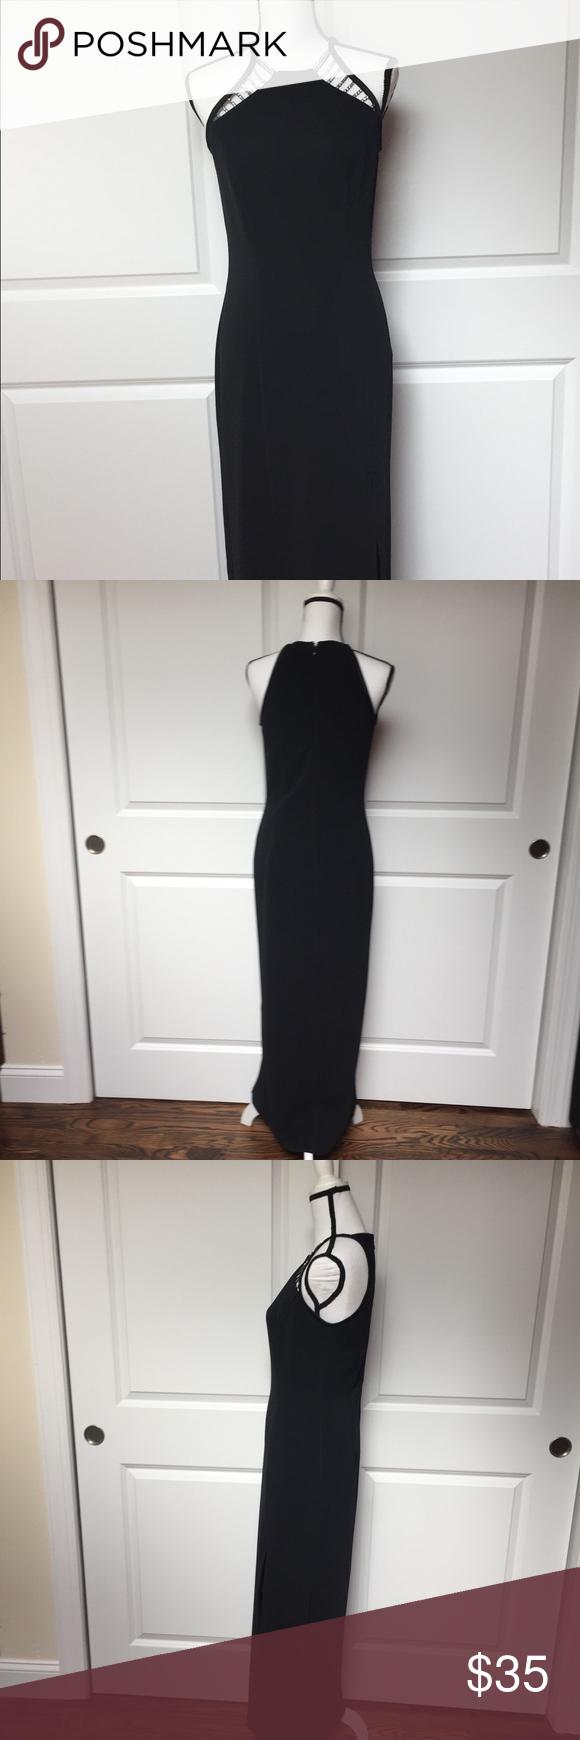 Barijay black eveningformal gown